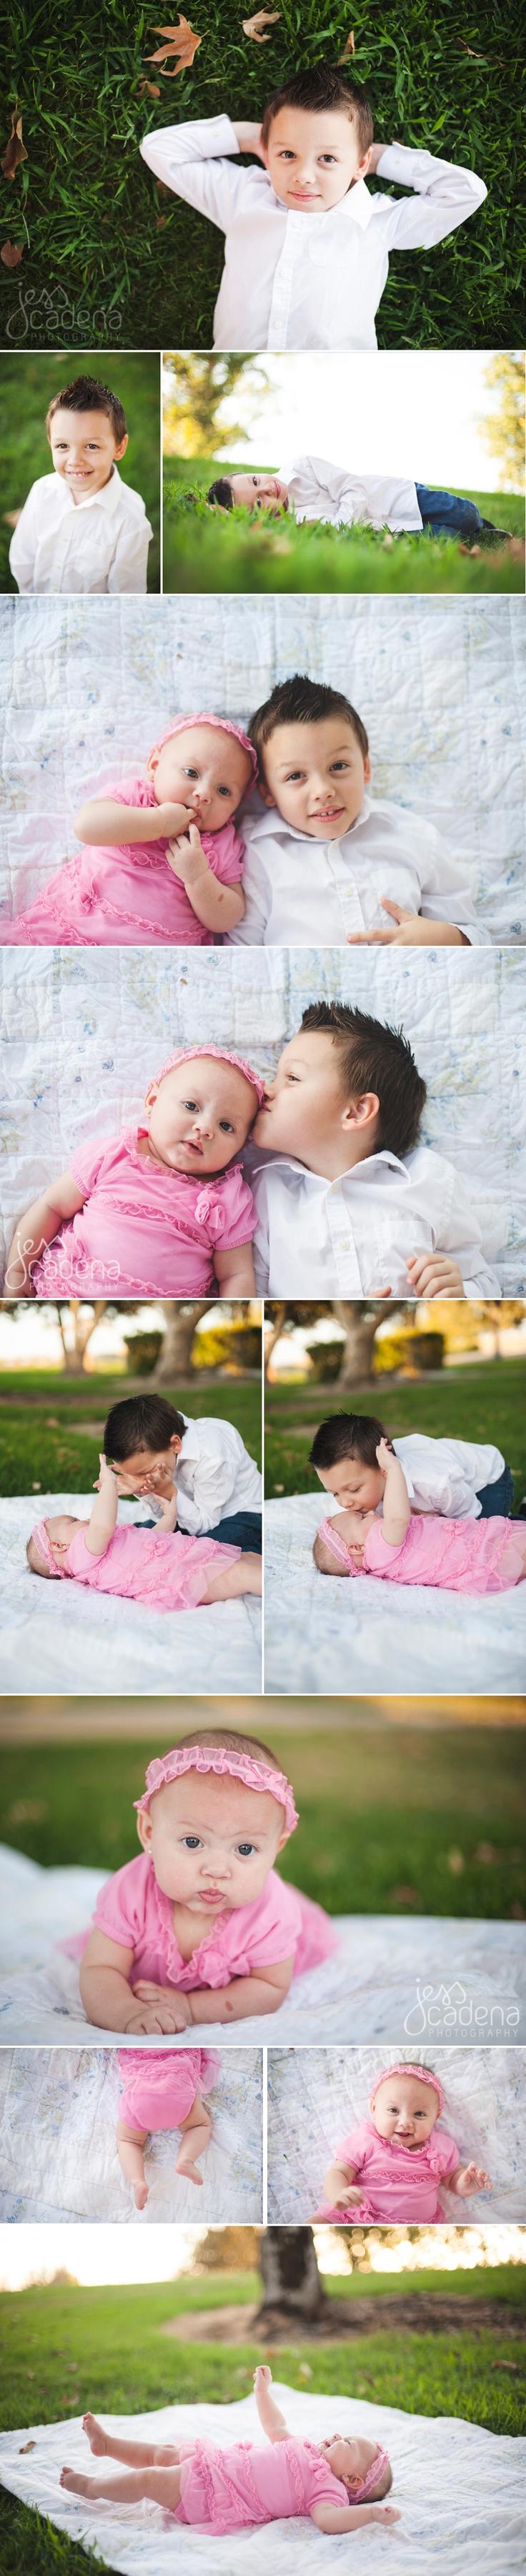 Brother & Sister portraits | Jess Cadena Photographer